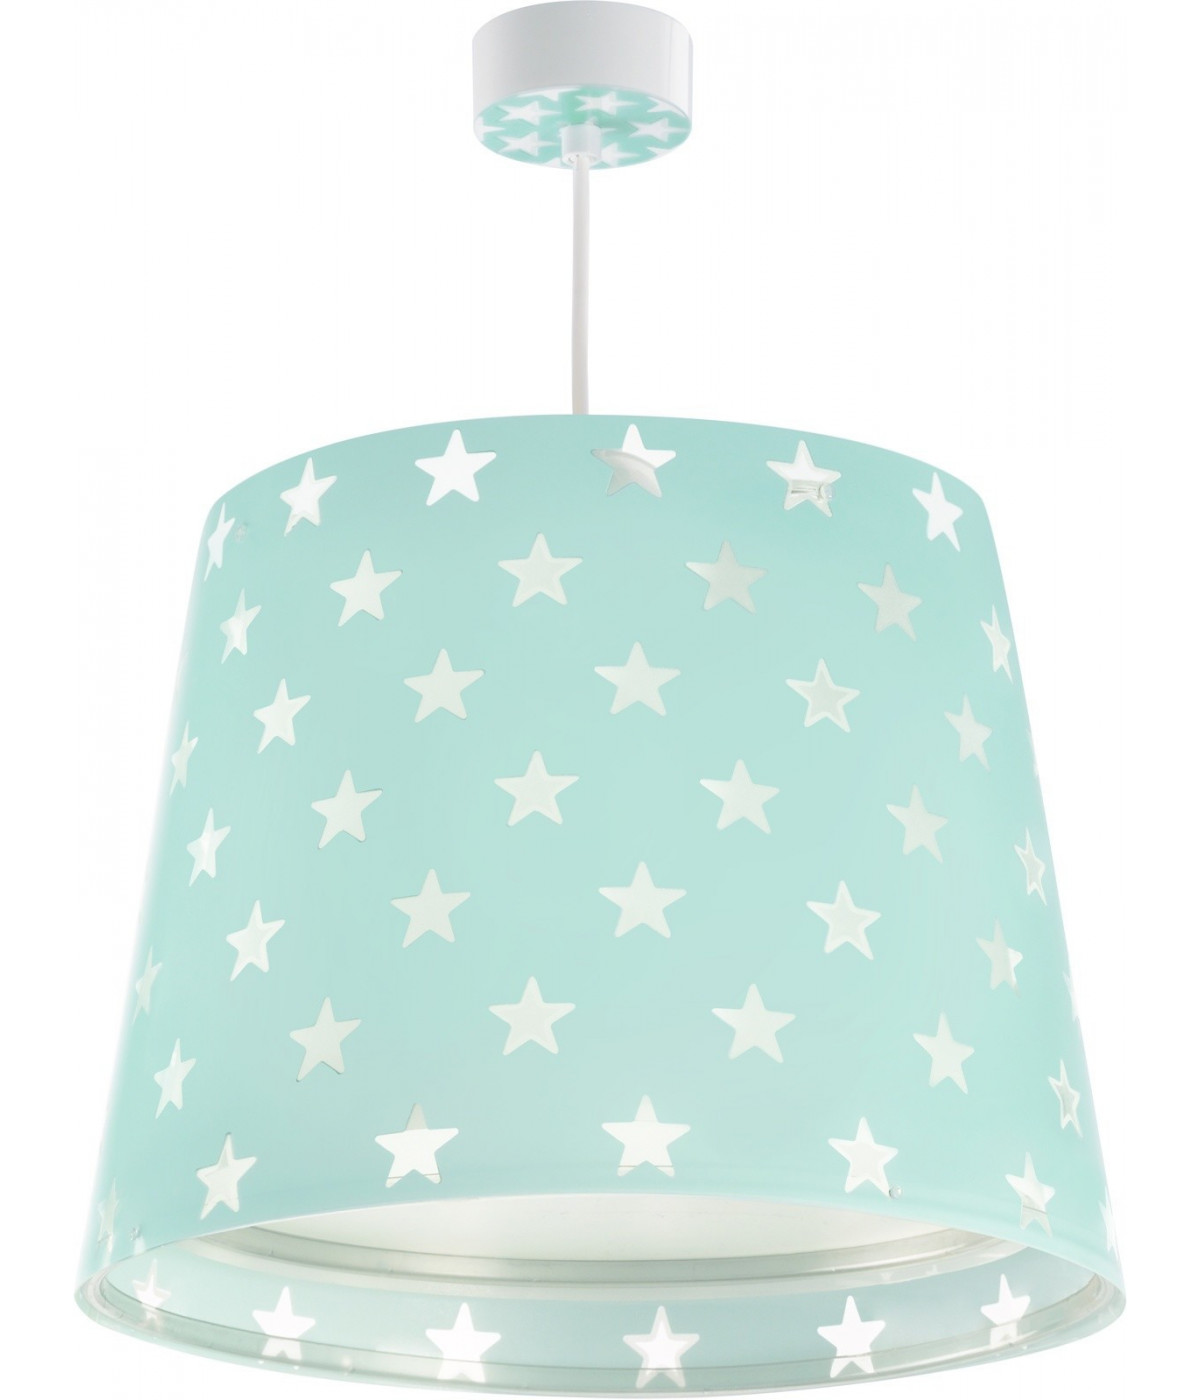 Hanging lamp for Kids Stars green